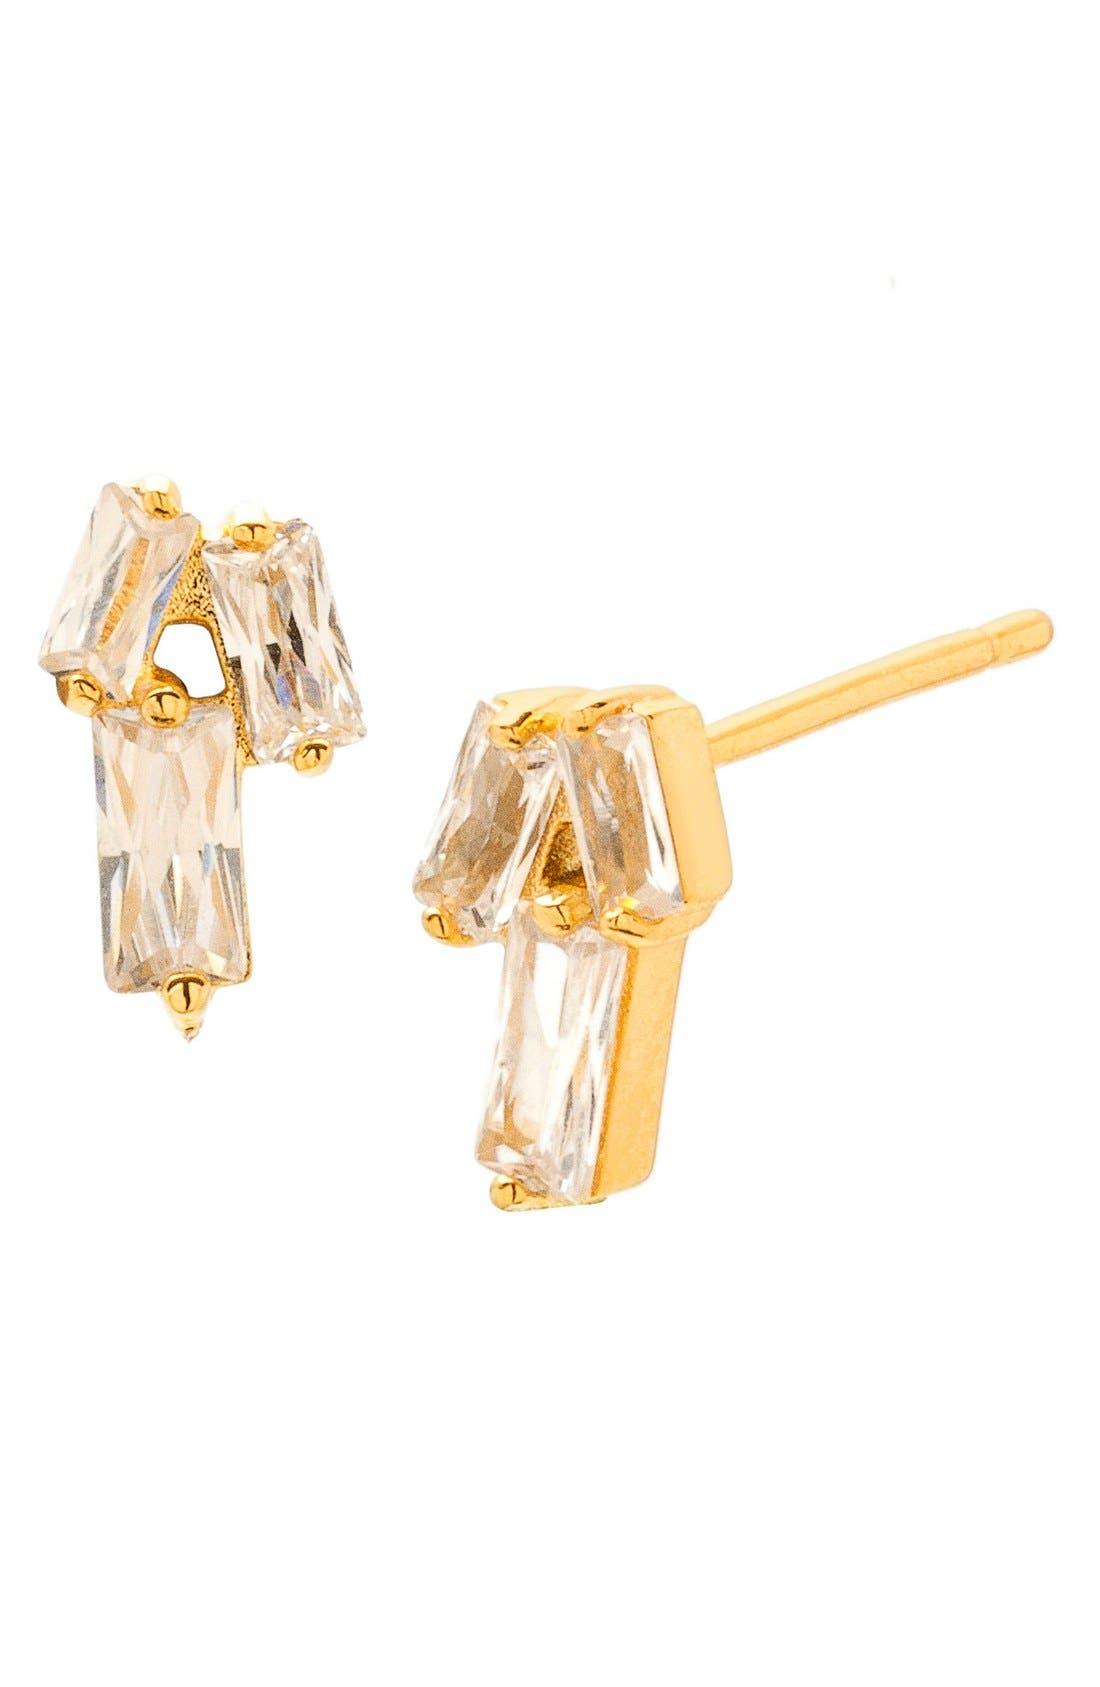 Main Image - gorjana Amara Cubic Zirconia Stud Earrings